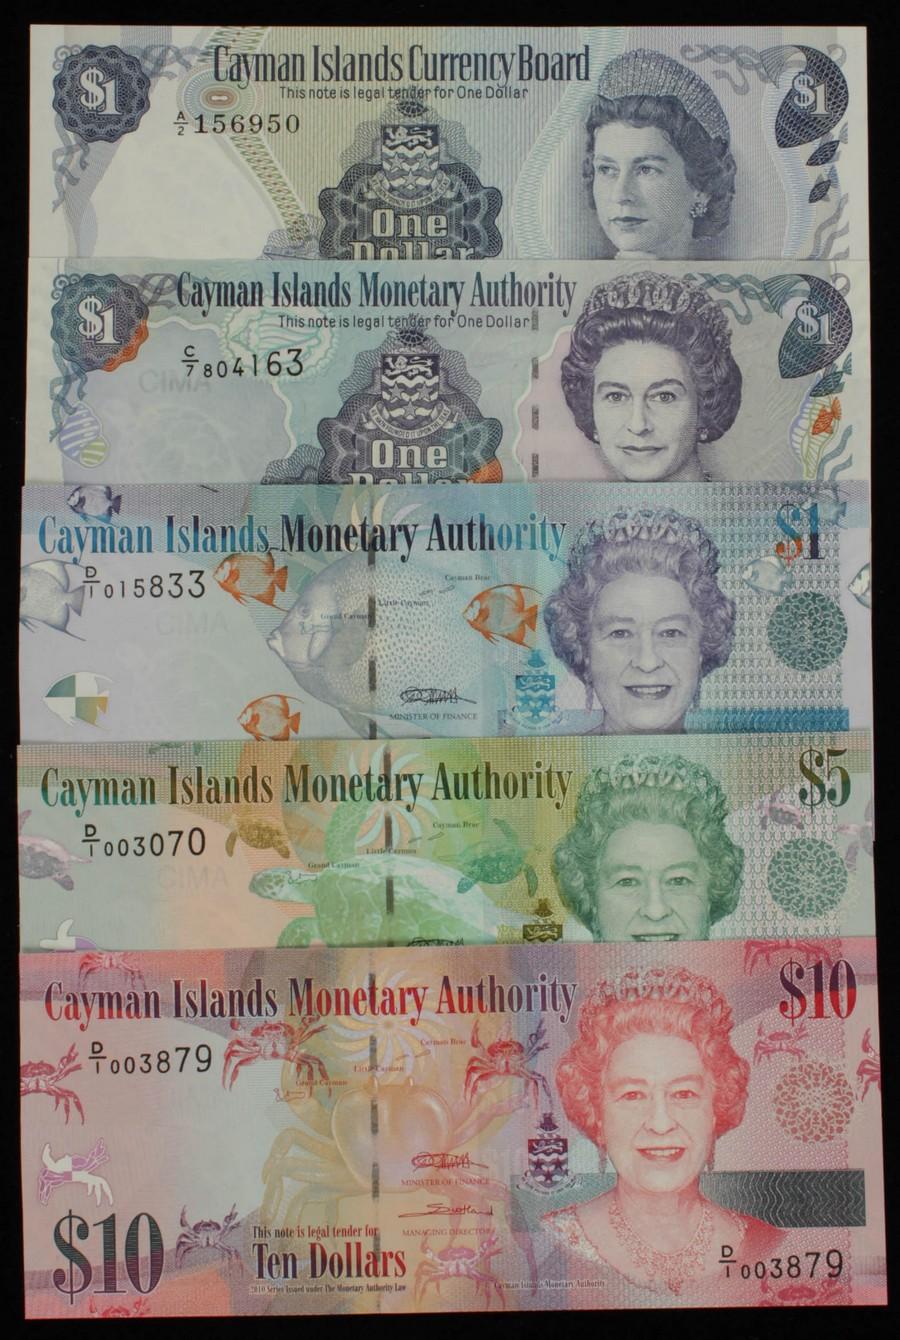 2006 5 1972 $5 Qeii 2010 Relieving Rheumatism $10 Qeii 2010 Unc. 2010 Tireless Cayman : $1 Qeii